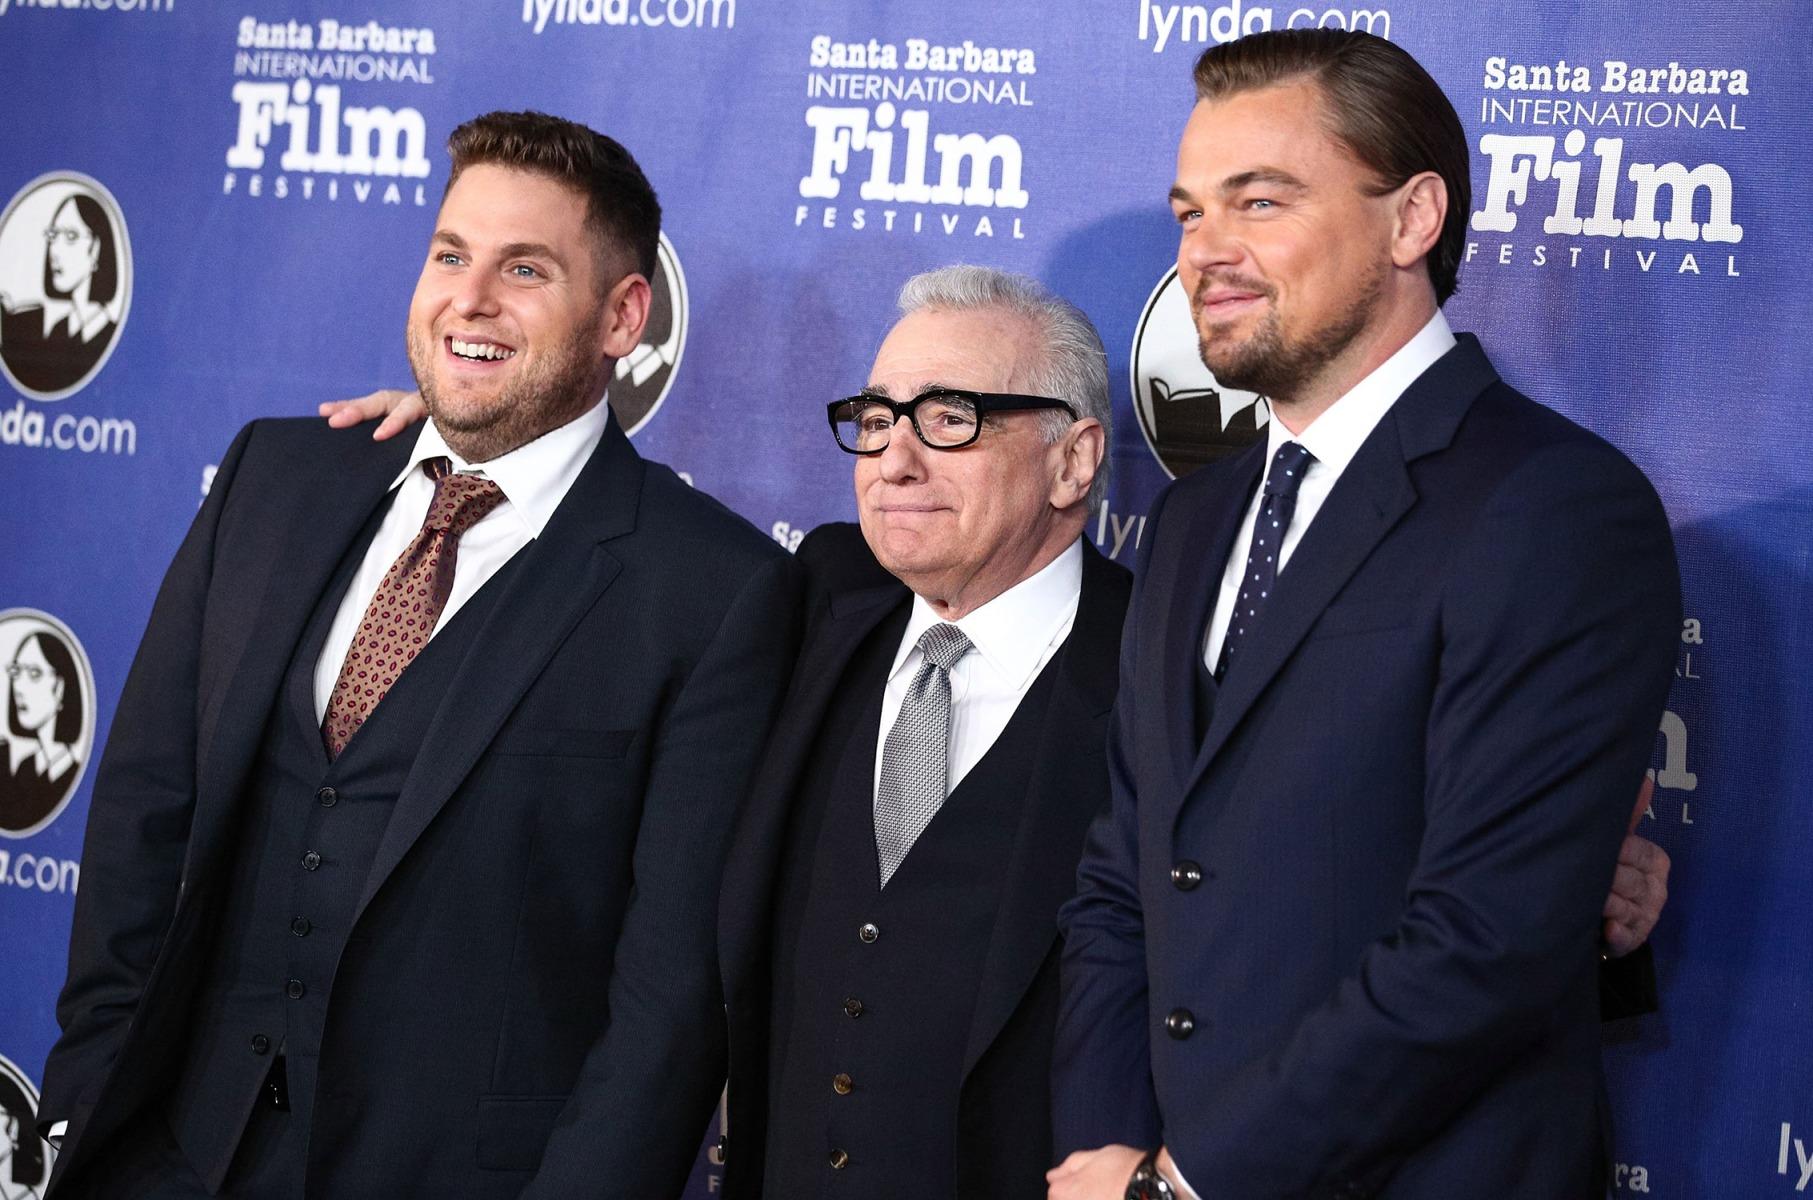 Image: 29h Annual Santa Barbara International Film Festival - Cinema Vanguard Award Honoring Martin Scorsese And Leonardo DiCaprio